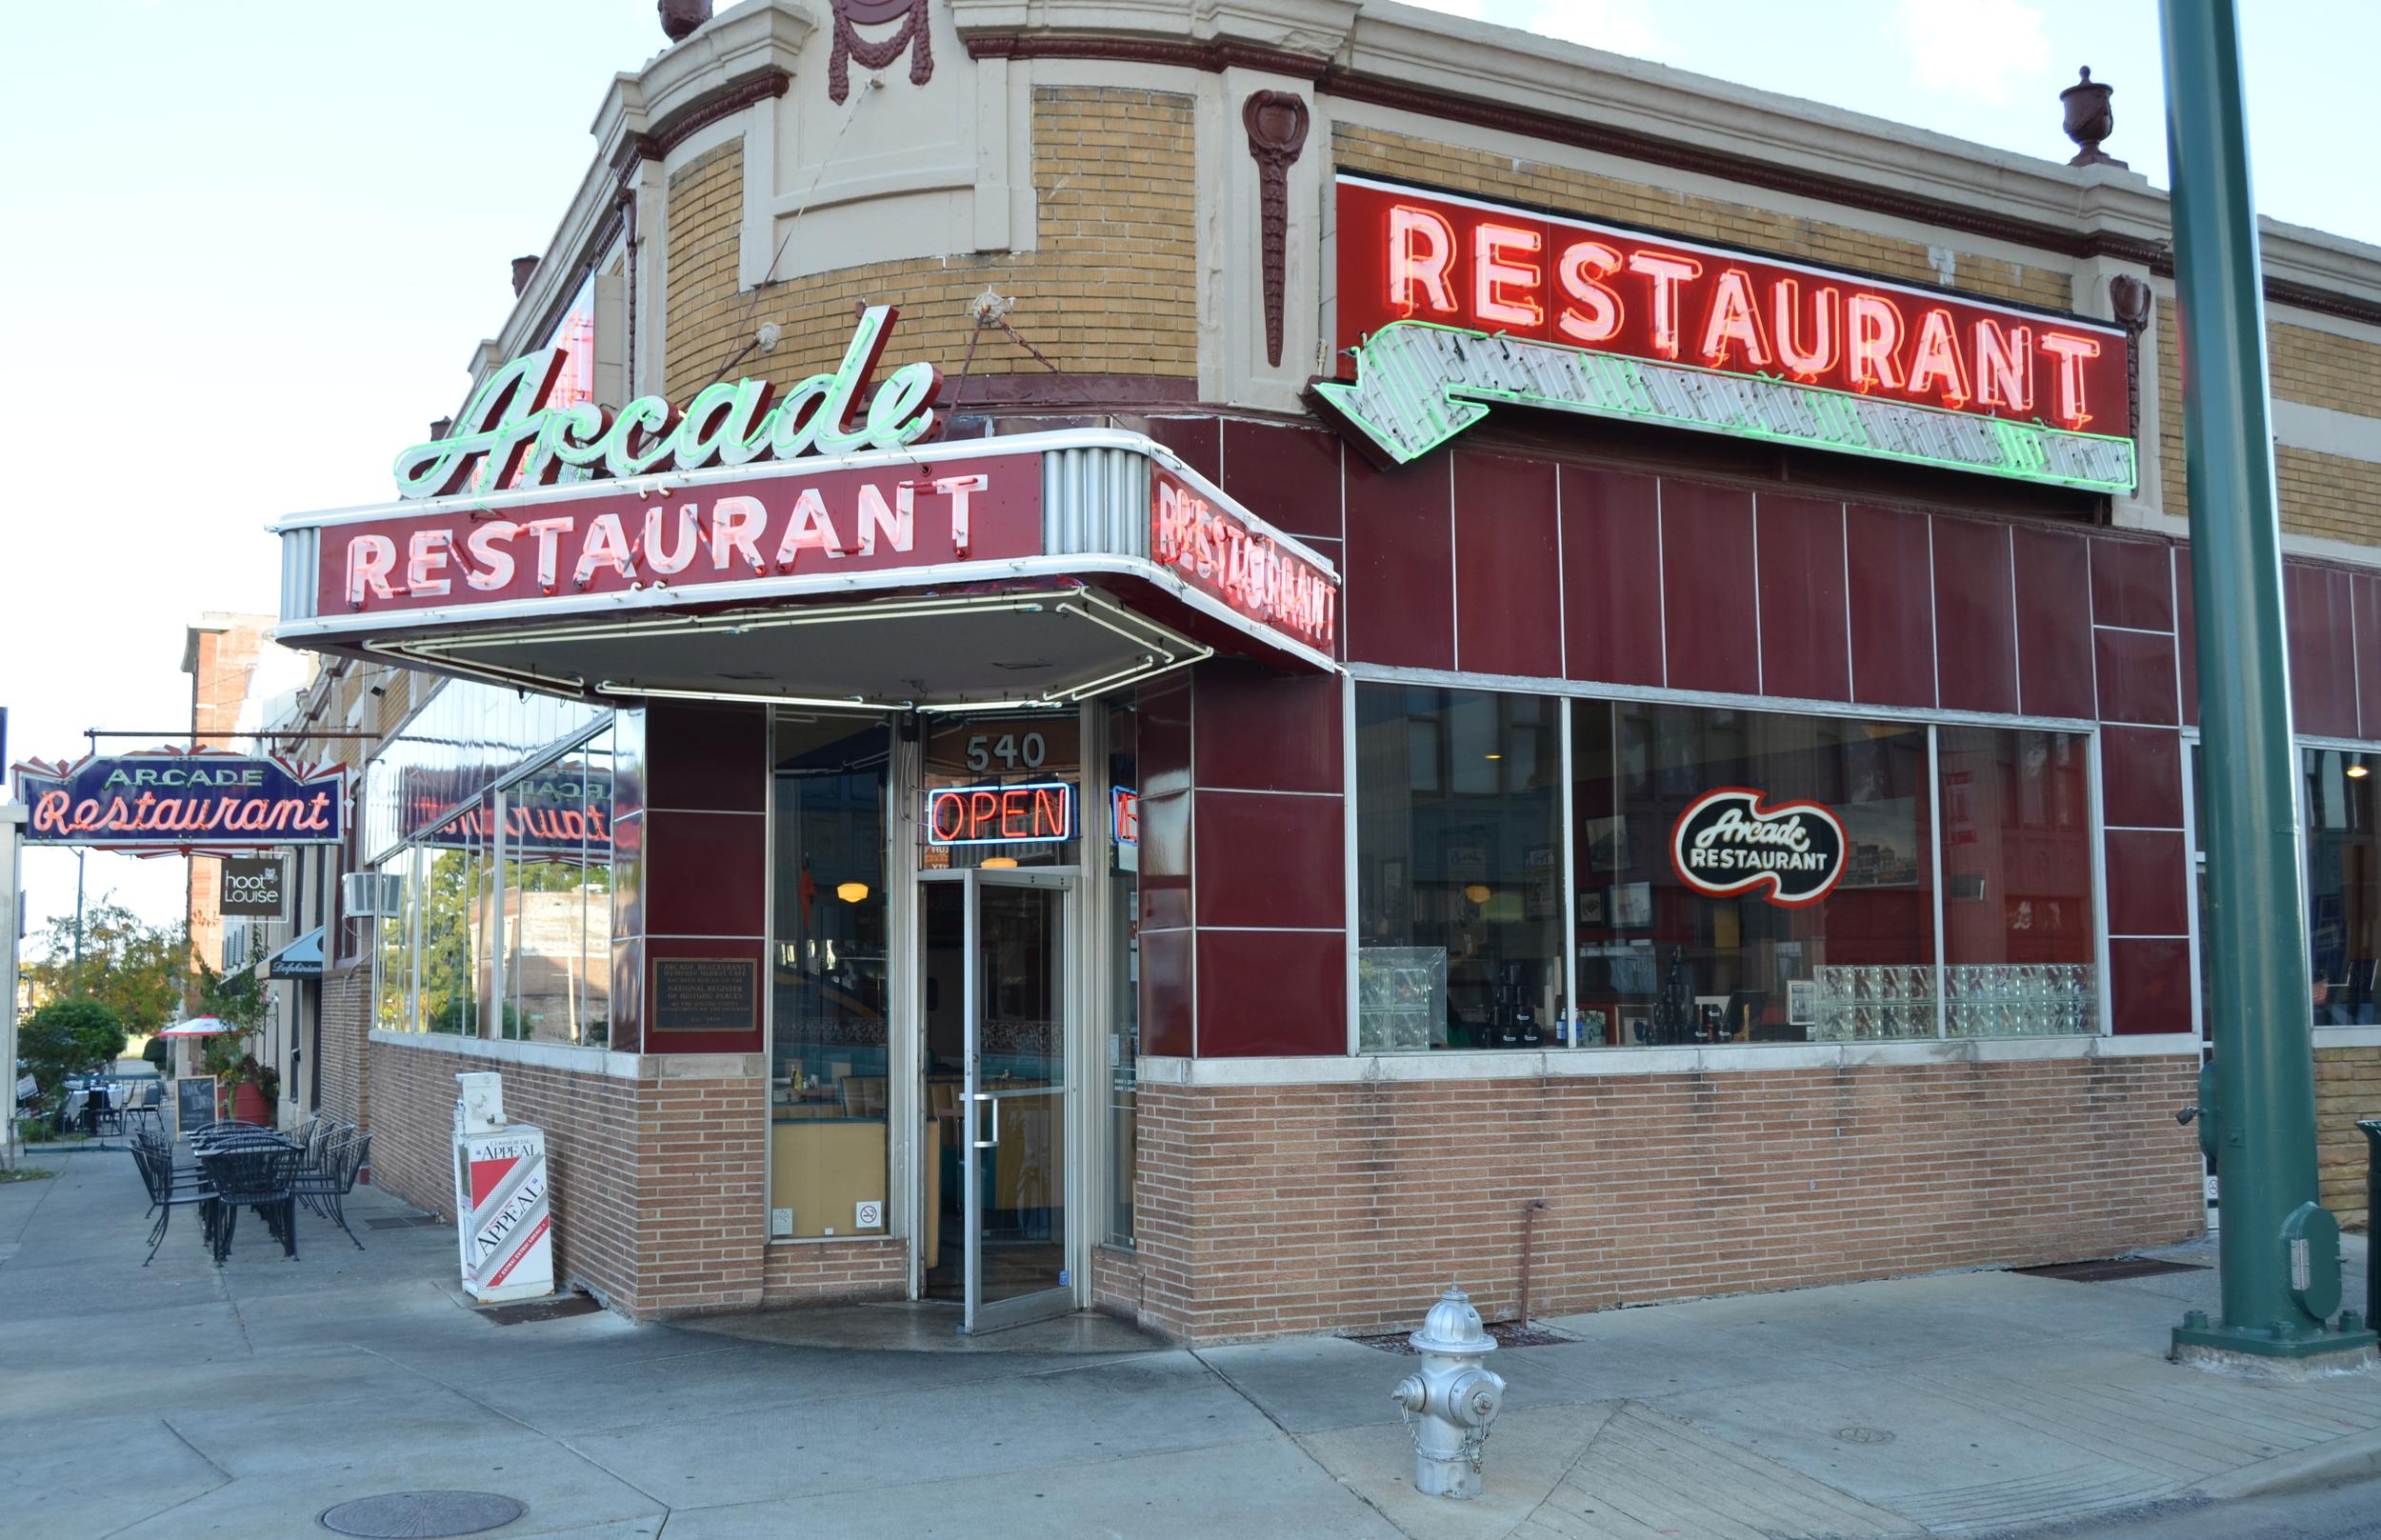 Pictures The Arcade Restaurant